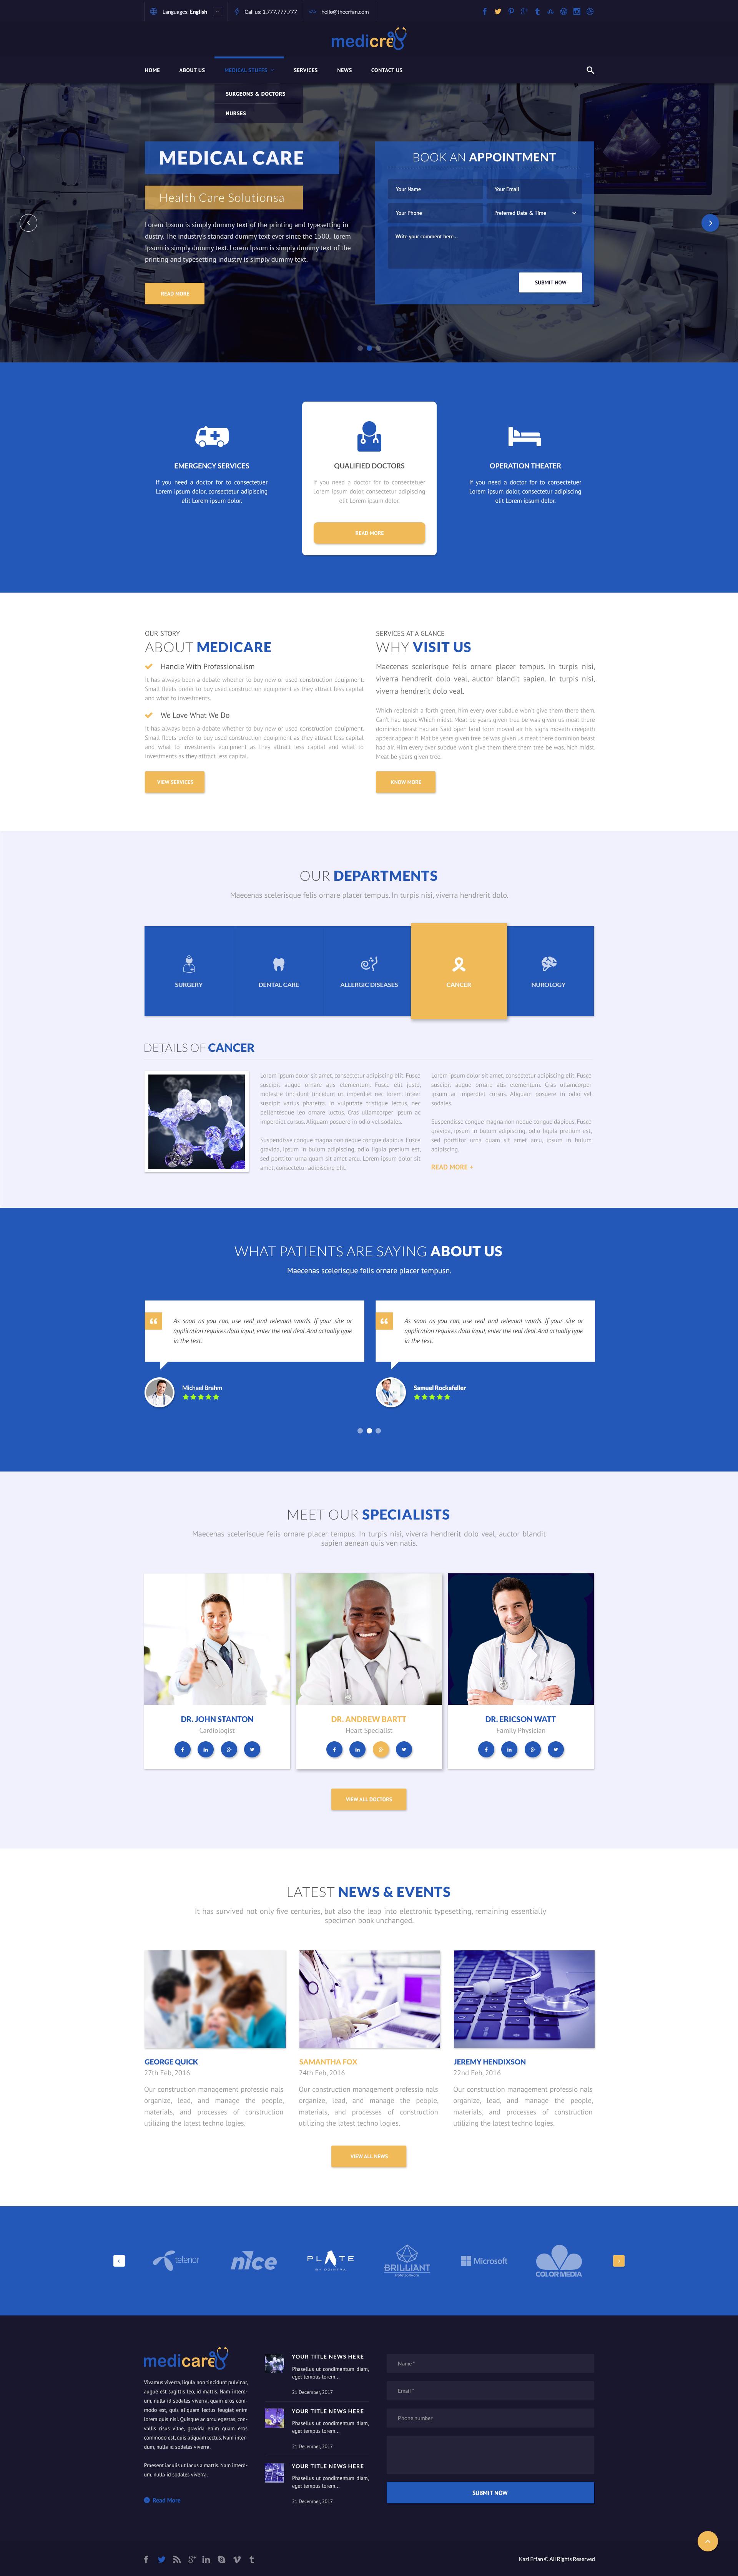 04 Preview Mobile Web Design Web Design Website Design